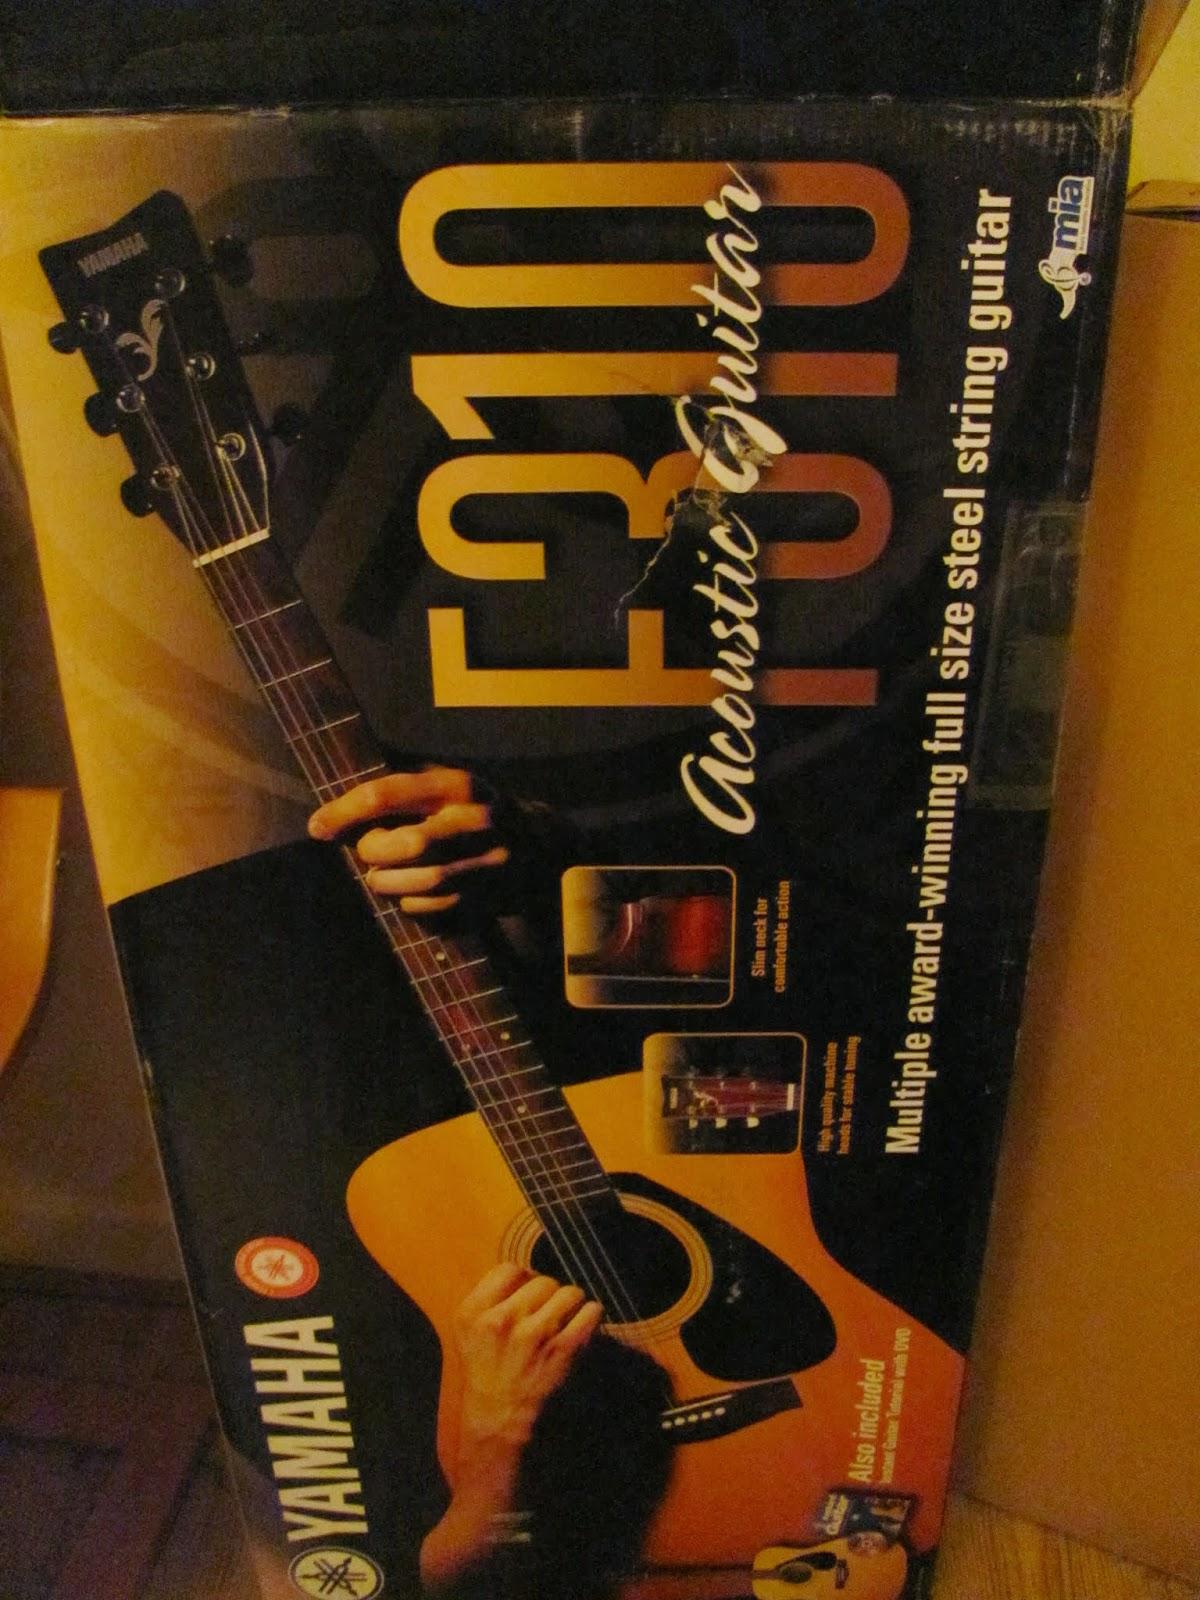 Yamaha F310 Acoustic Guitar Box Art